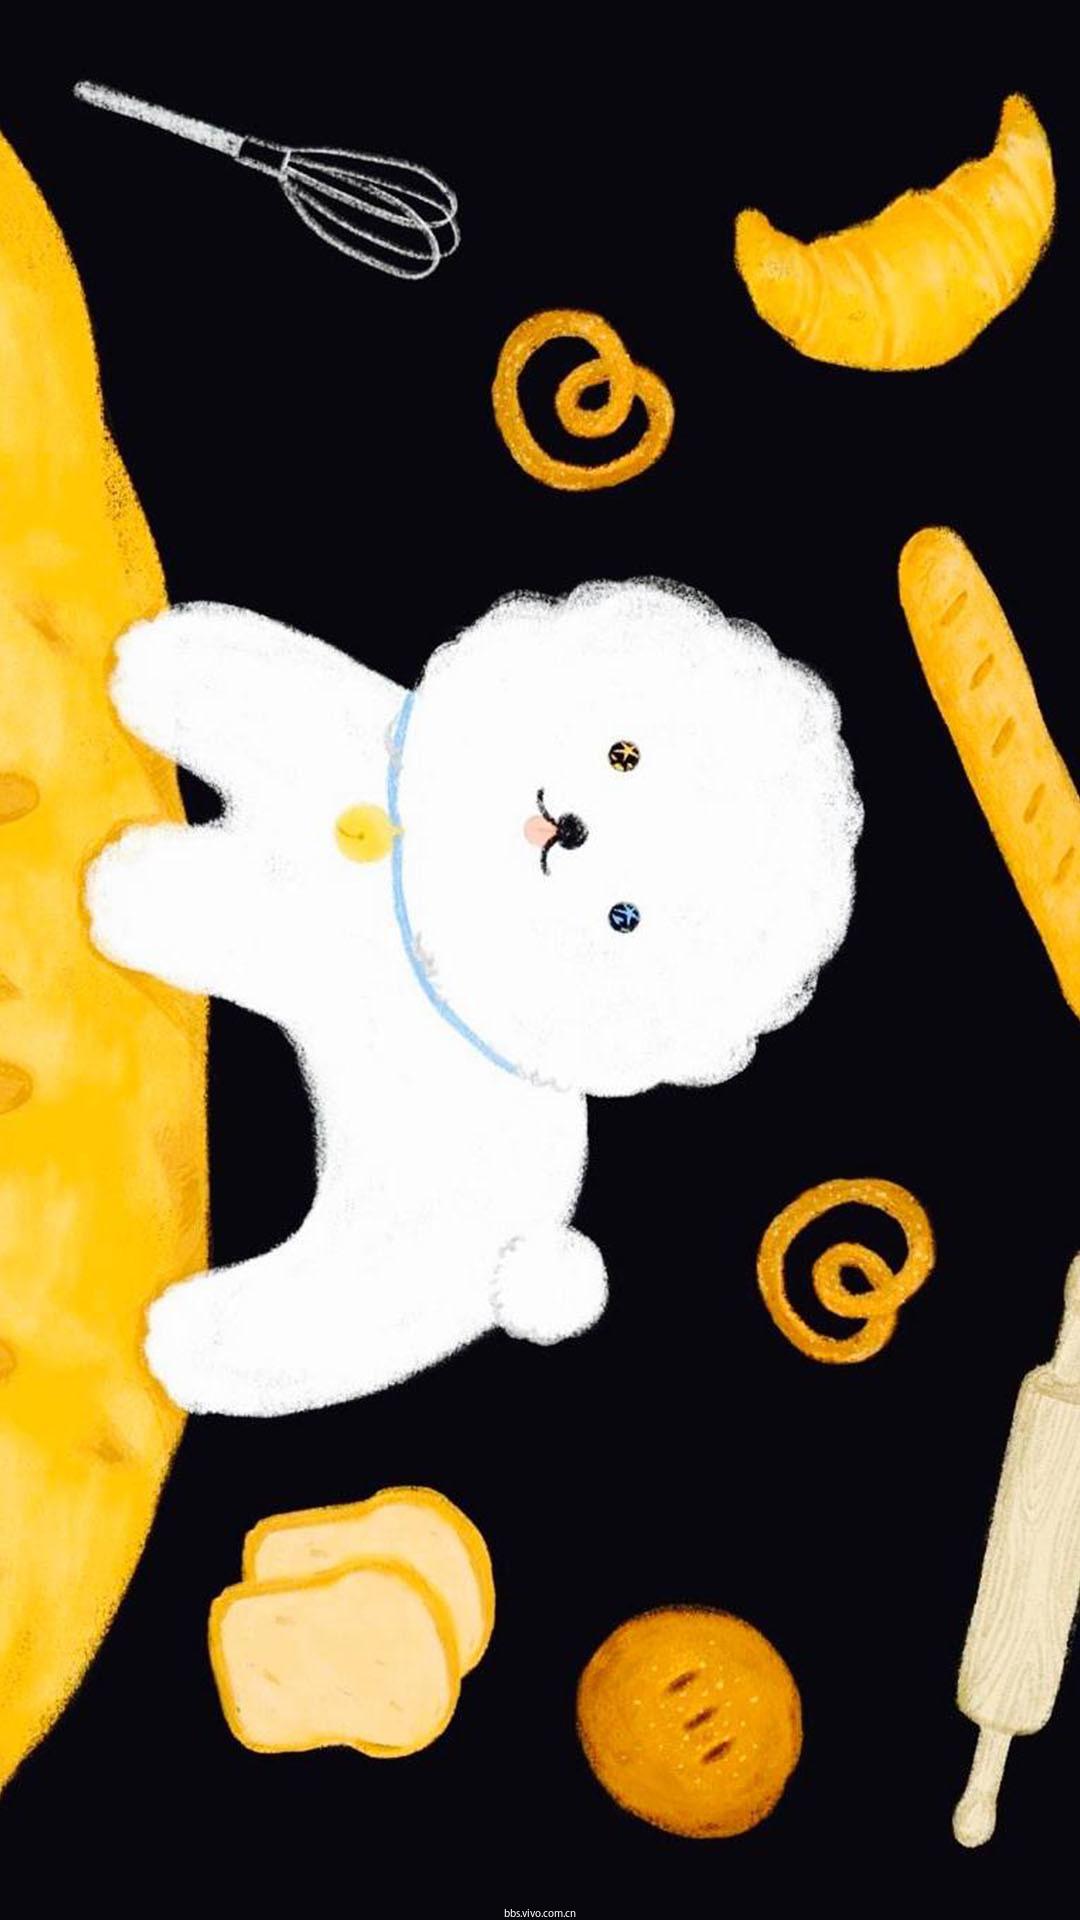 【v粉主题素材壁纸】可爱卡通小狗创意手绘高清手机壁纸